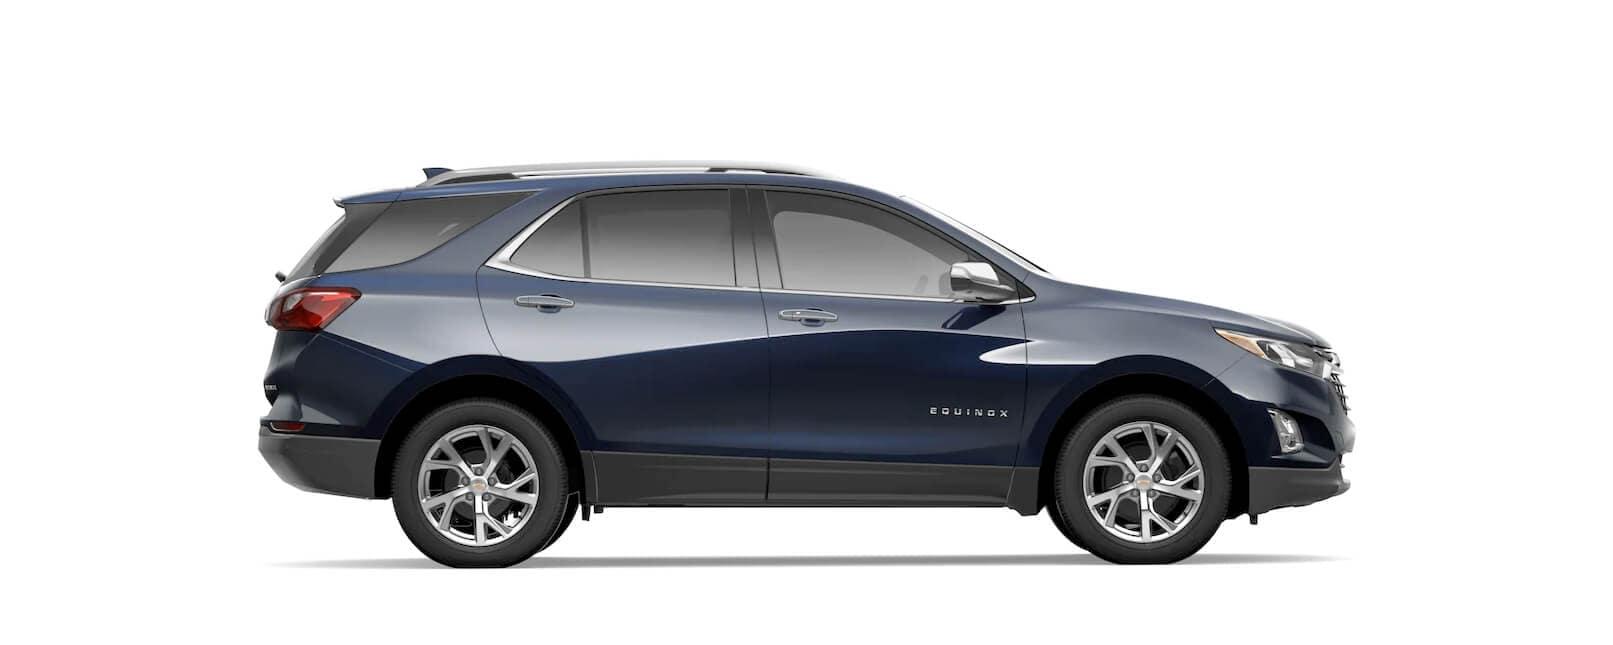 New Chevrolet Vehicles 2022 Equinox